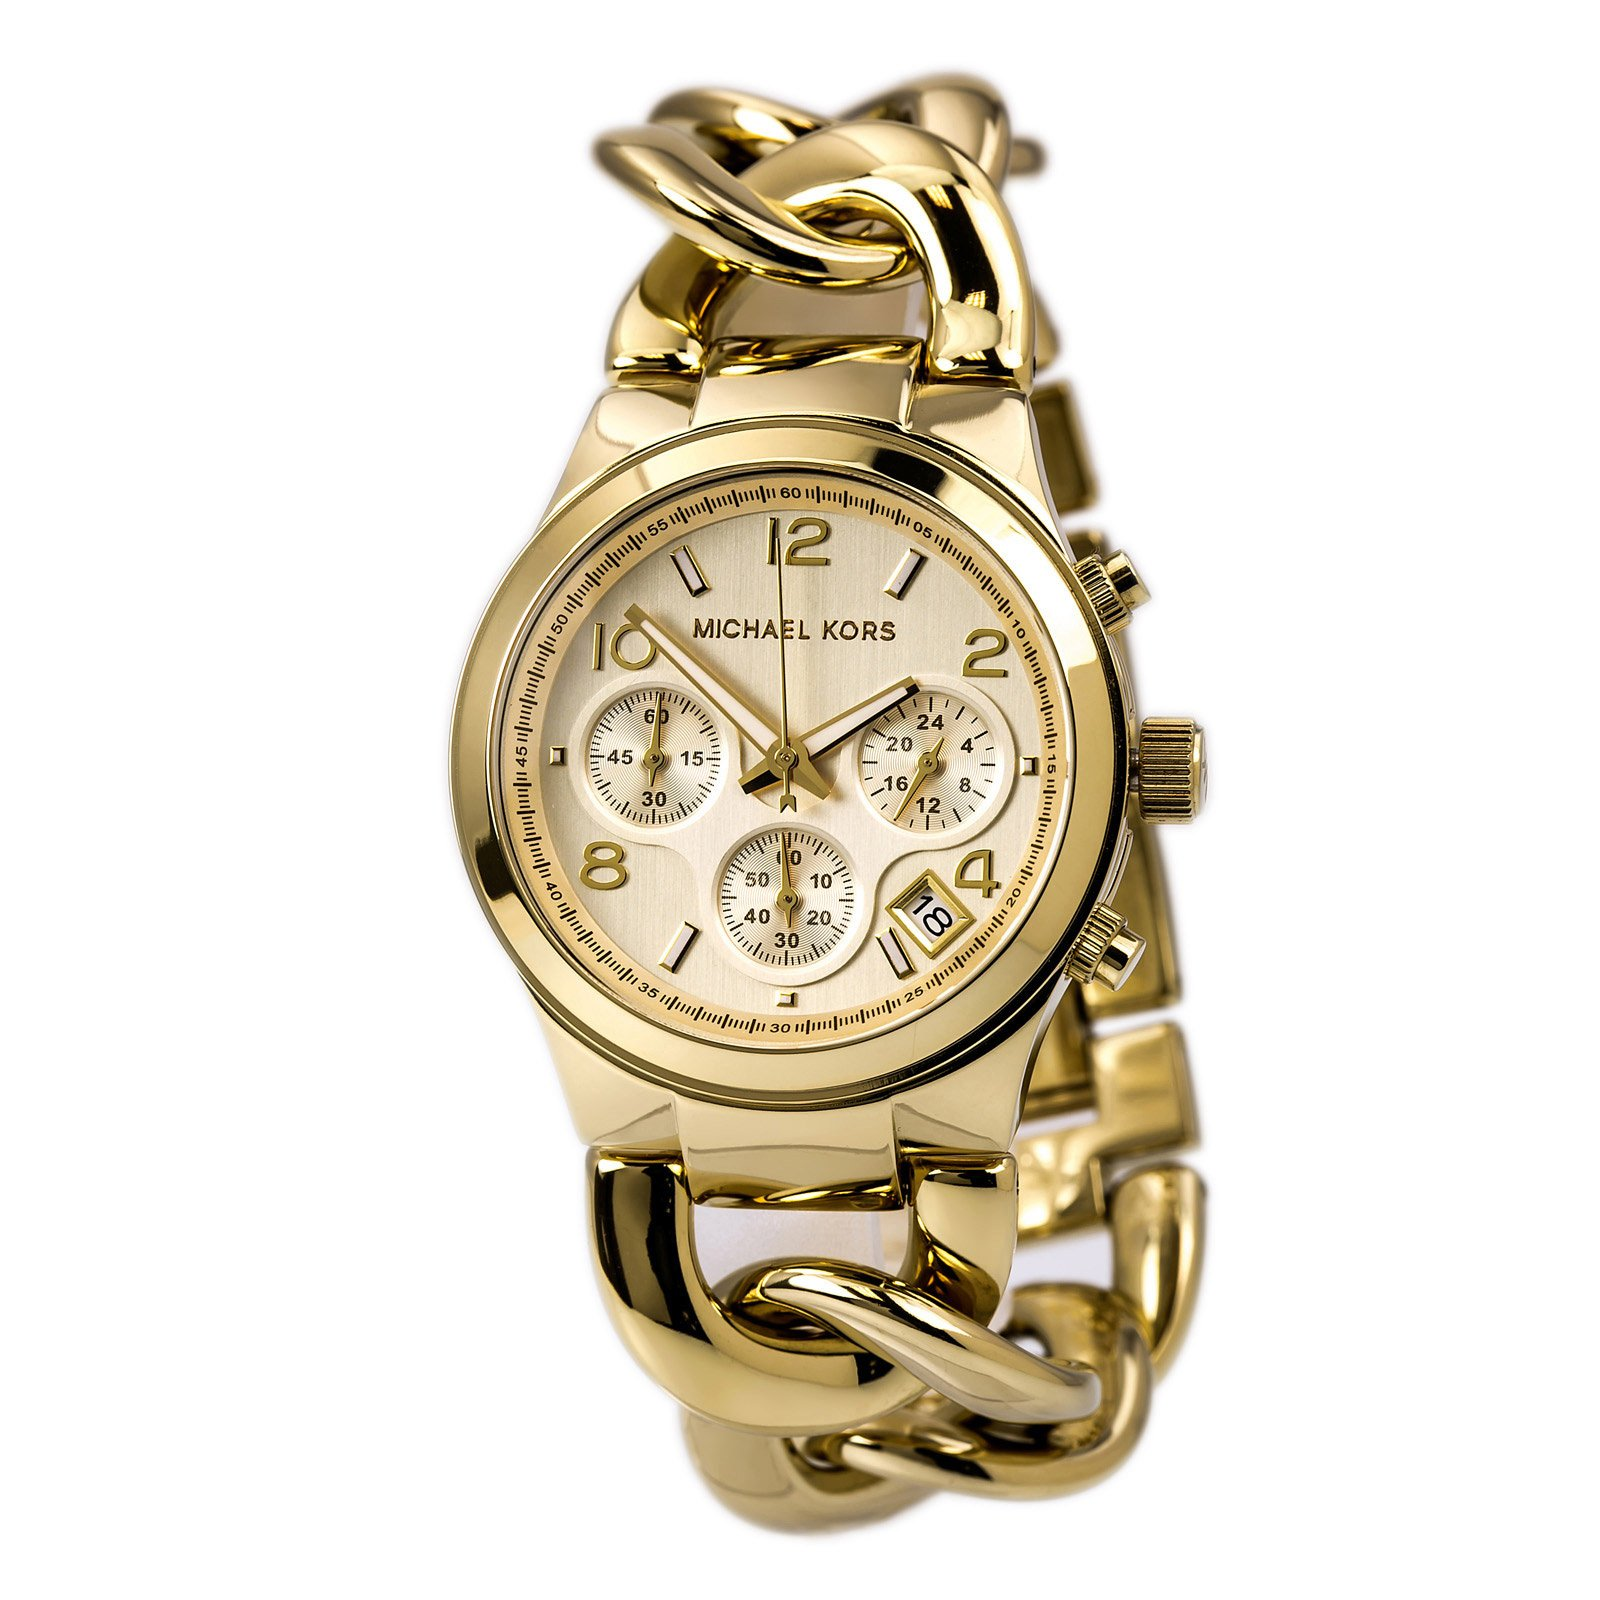 Michael Kors Gold Tone Chronograph MK3131 by Michael Kors